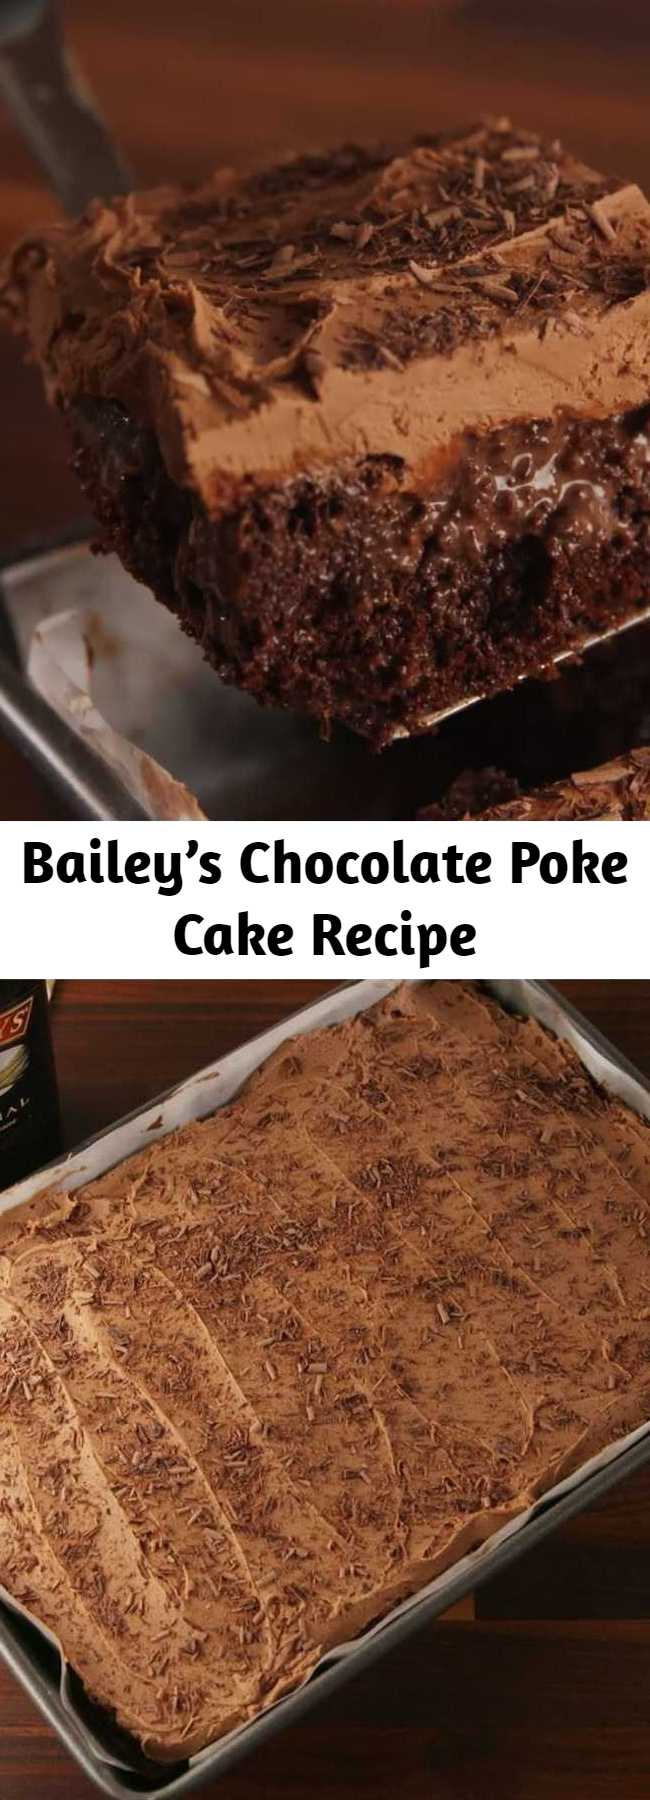 Bailey's Chocolate Poke Cake Recipe - Chocolate on chocolate. #food #easyrecipe #recipe #pastryporn #inspiration #ideas #diy #home #forkyeah #instagood